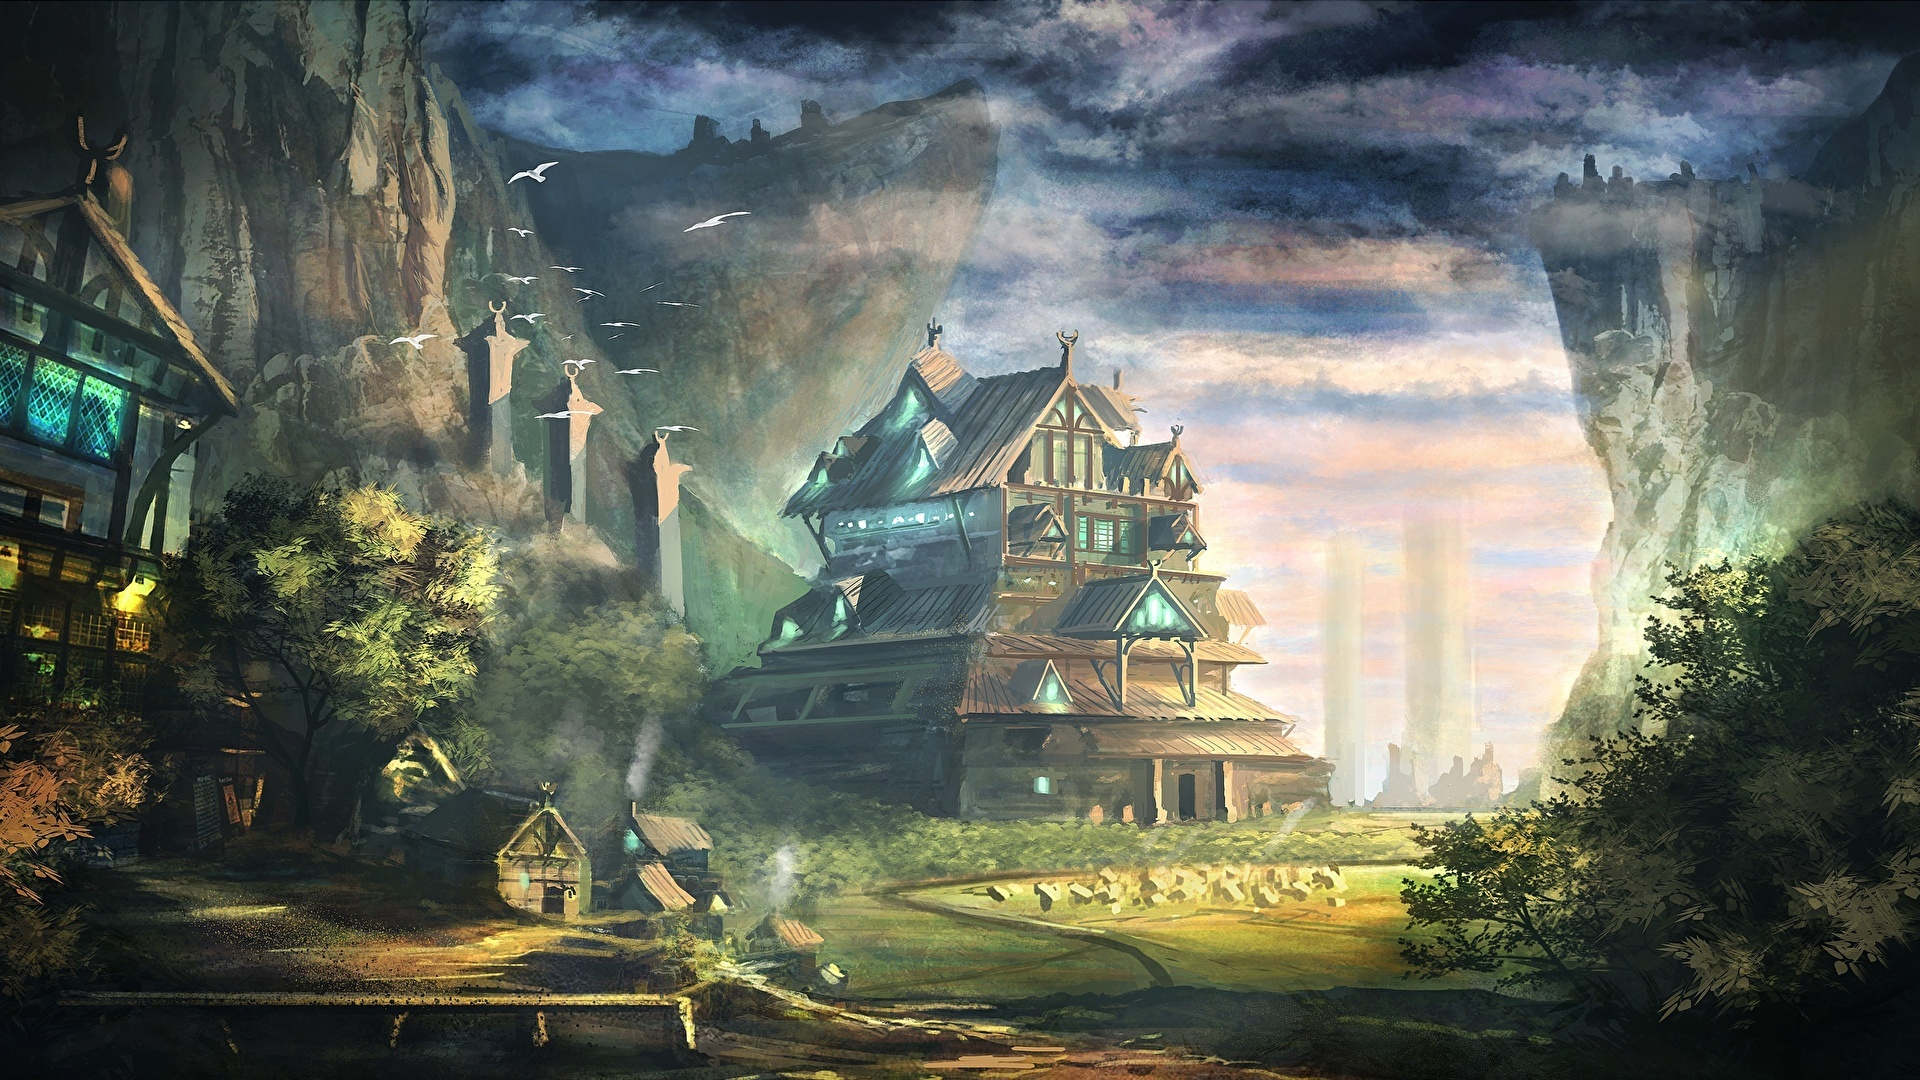 Fantasy Landsсape HD Desktop Wallpaper